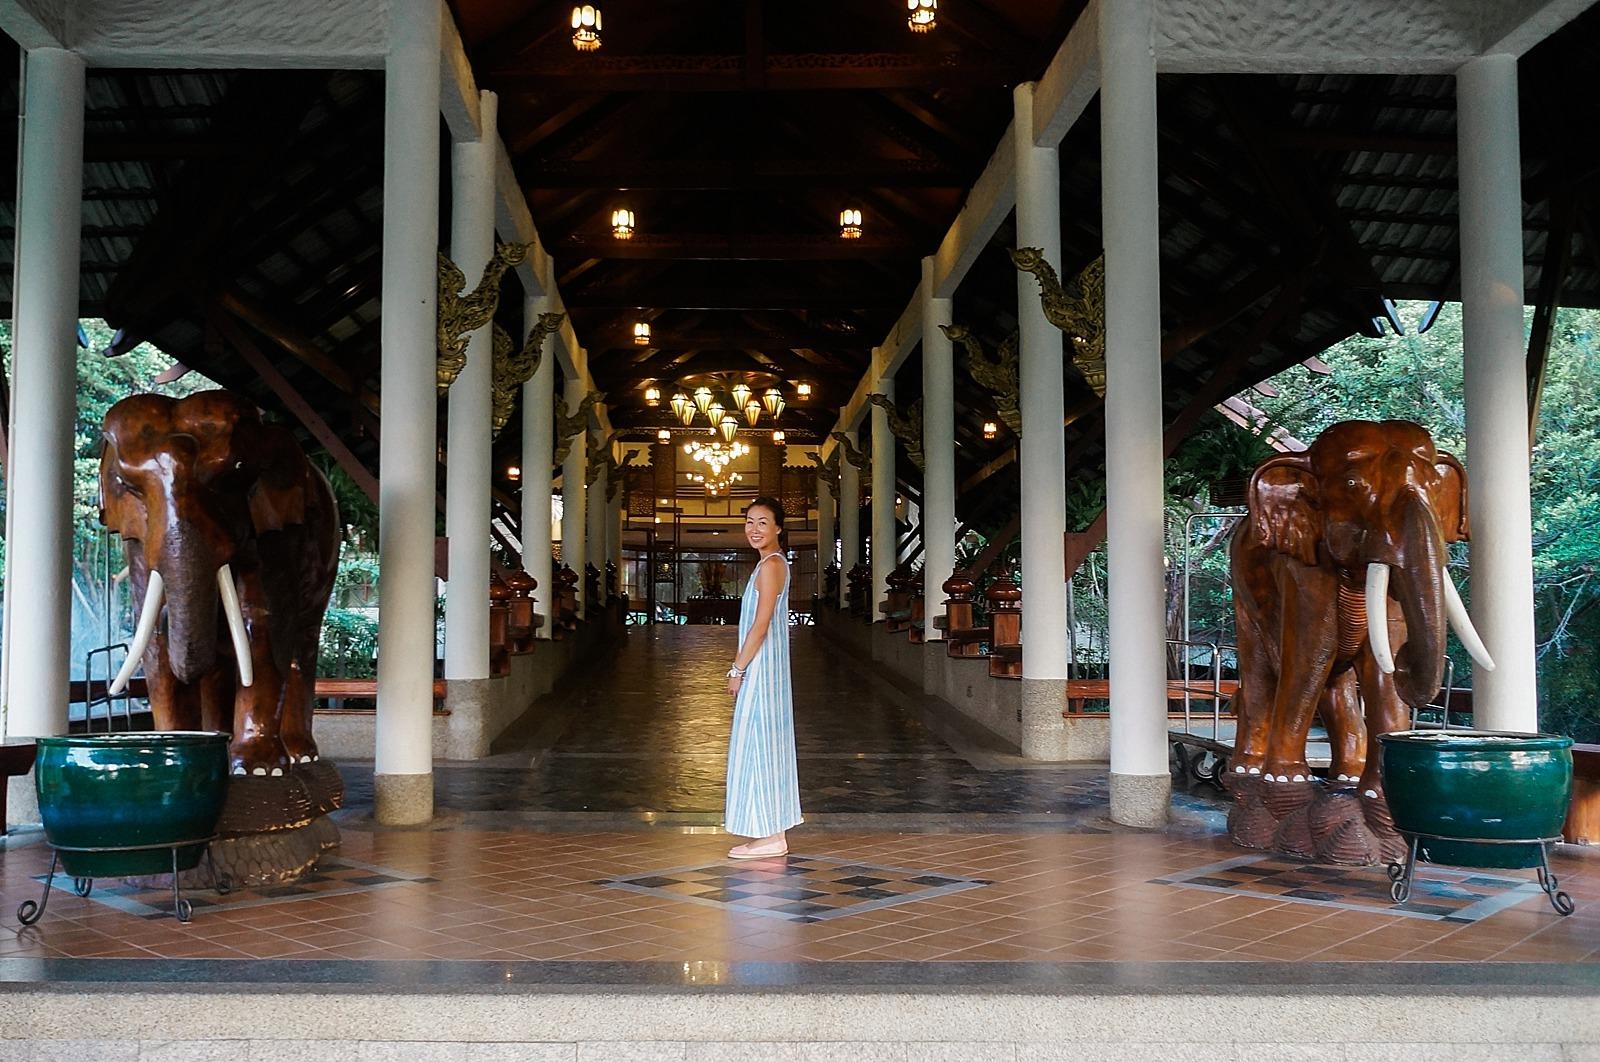 Thailand-diana-elizabeth-travel-blogger-phoenix-295